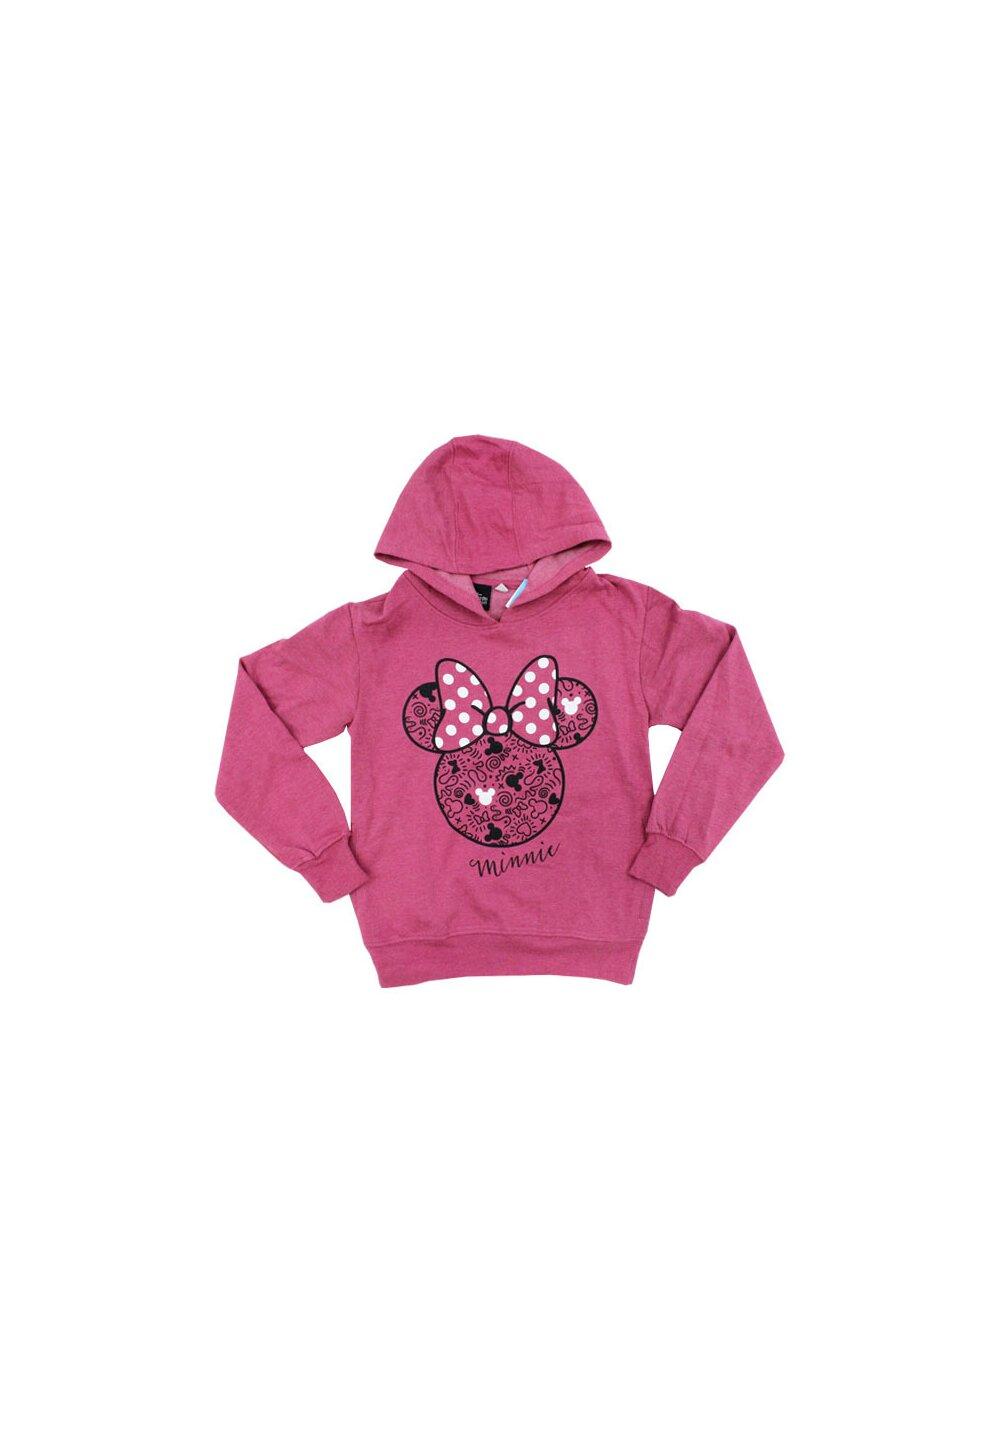 Hanorac cu gluga, Minnie Mouse, roz inchis